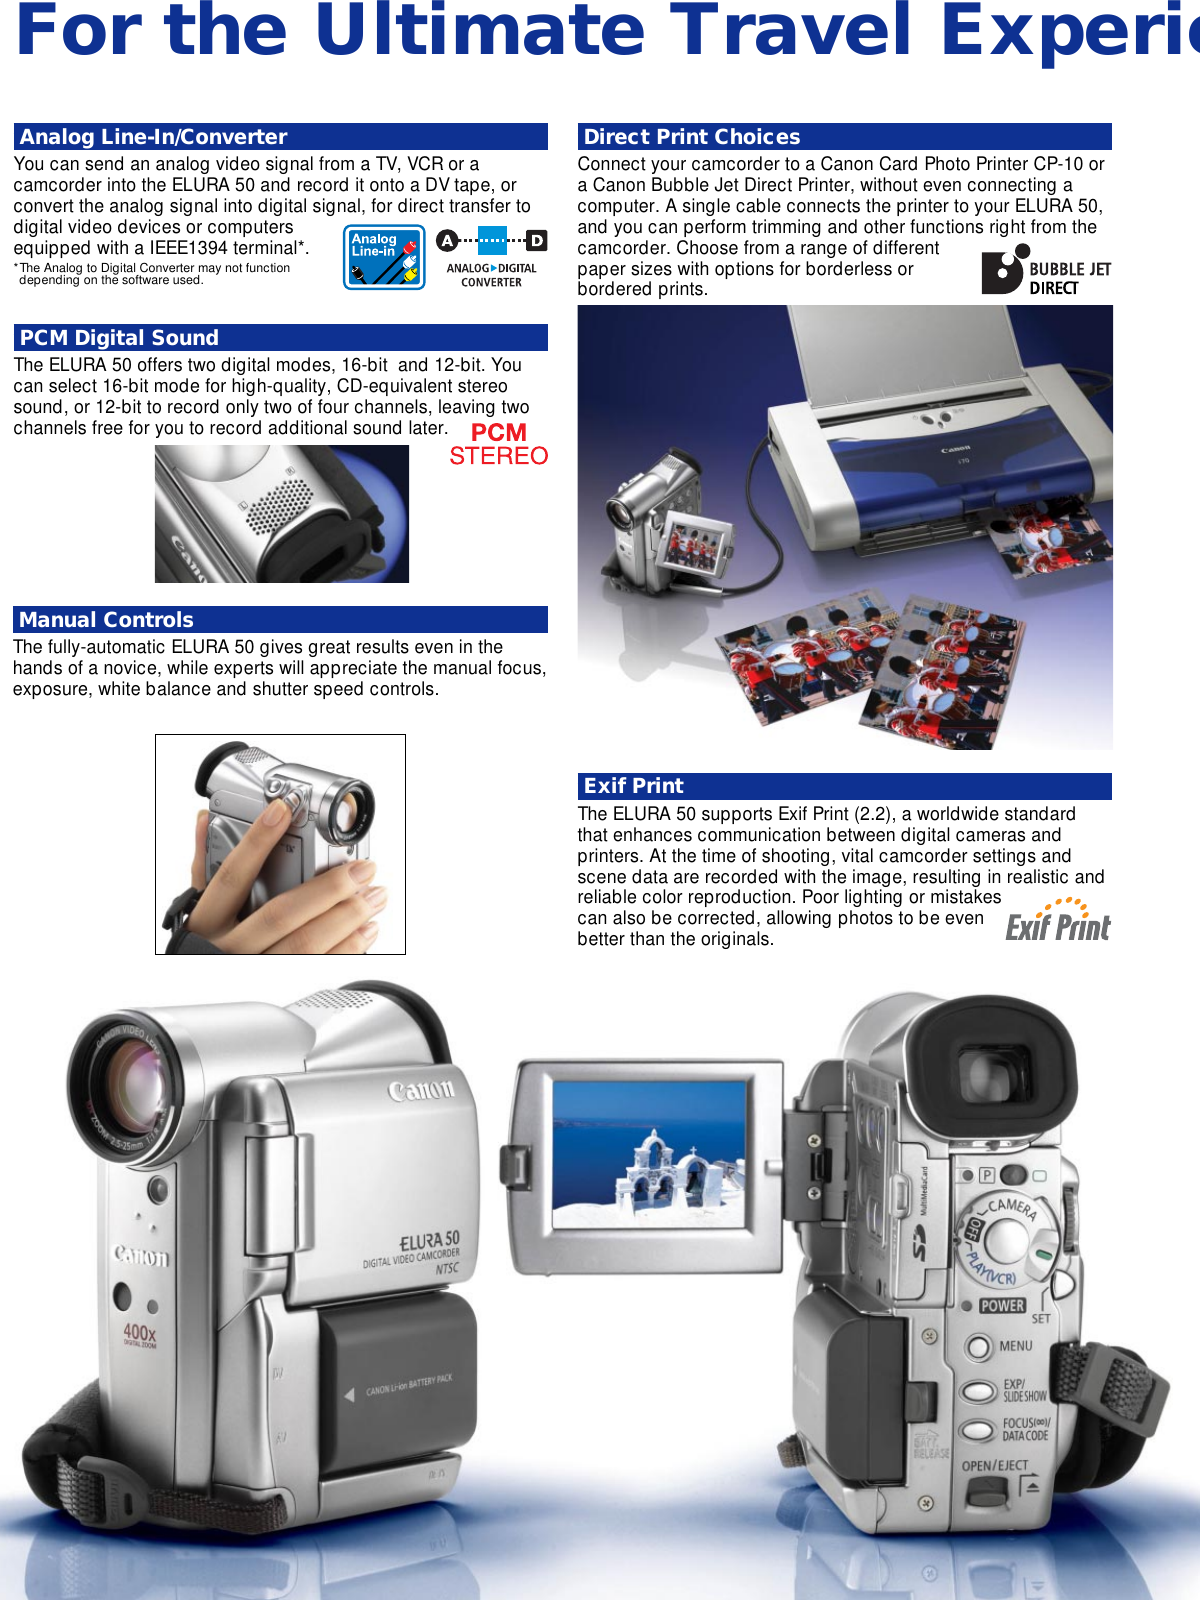 canon elura 50 elura2 mc user manual to the d66bead3 ab60 48be b039 rh usermanual wiki Canon Elura 60 Camcorder Canon Camcorder Elura 80